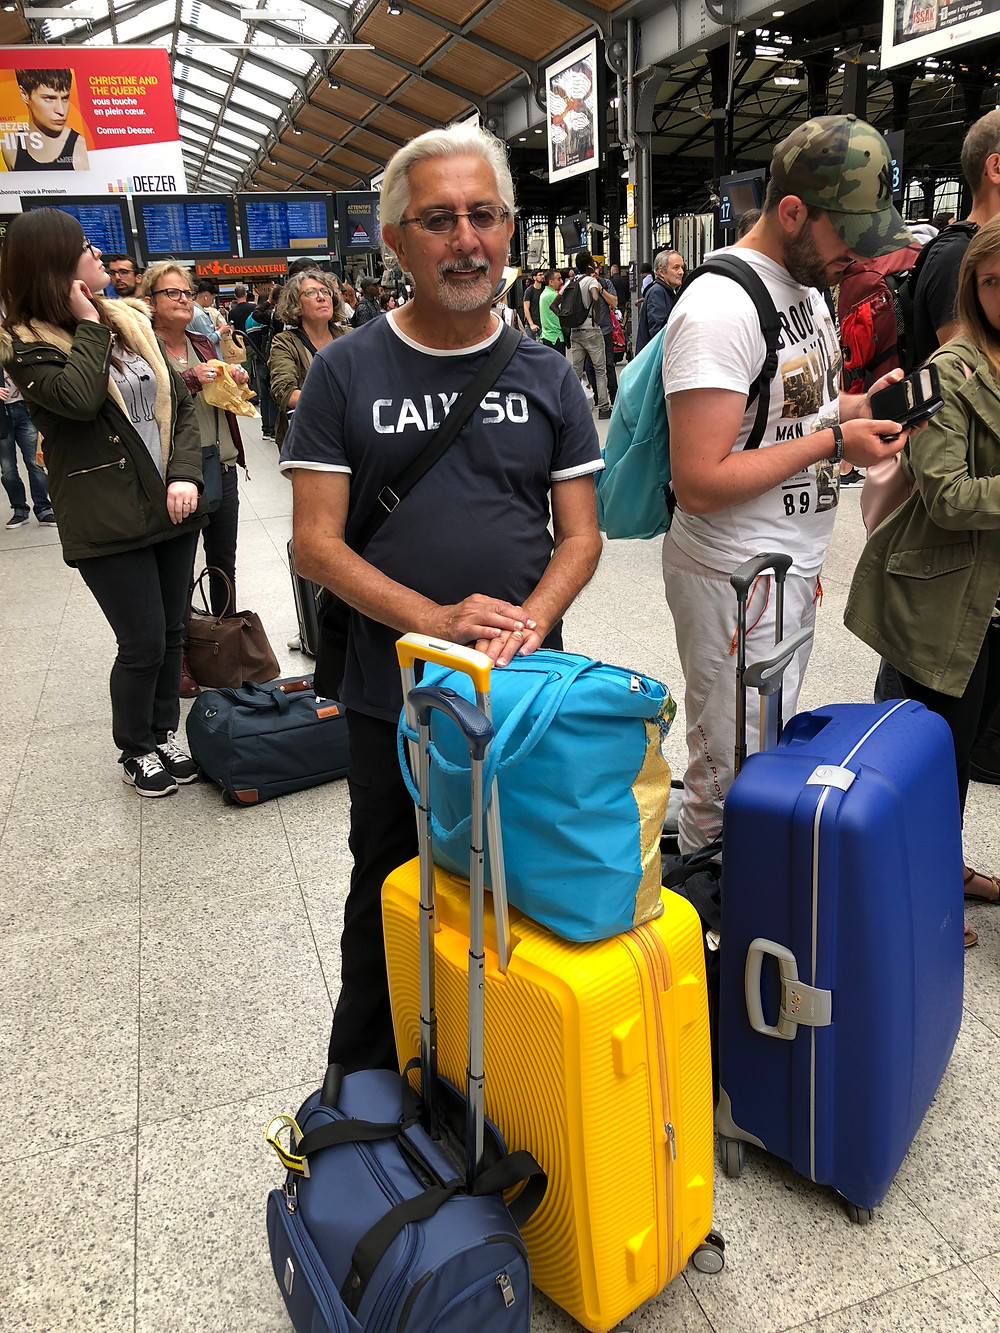 travel information, travel light, luggage storage